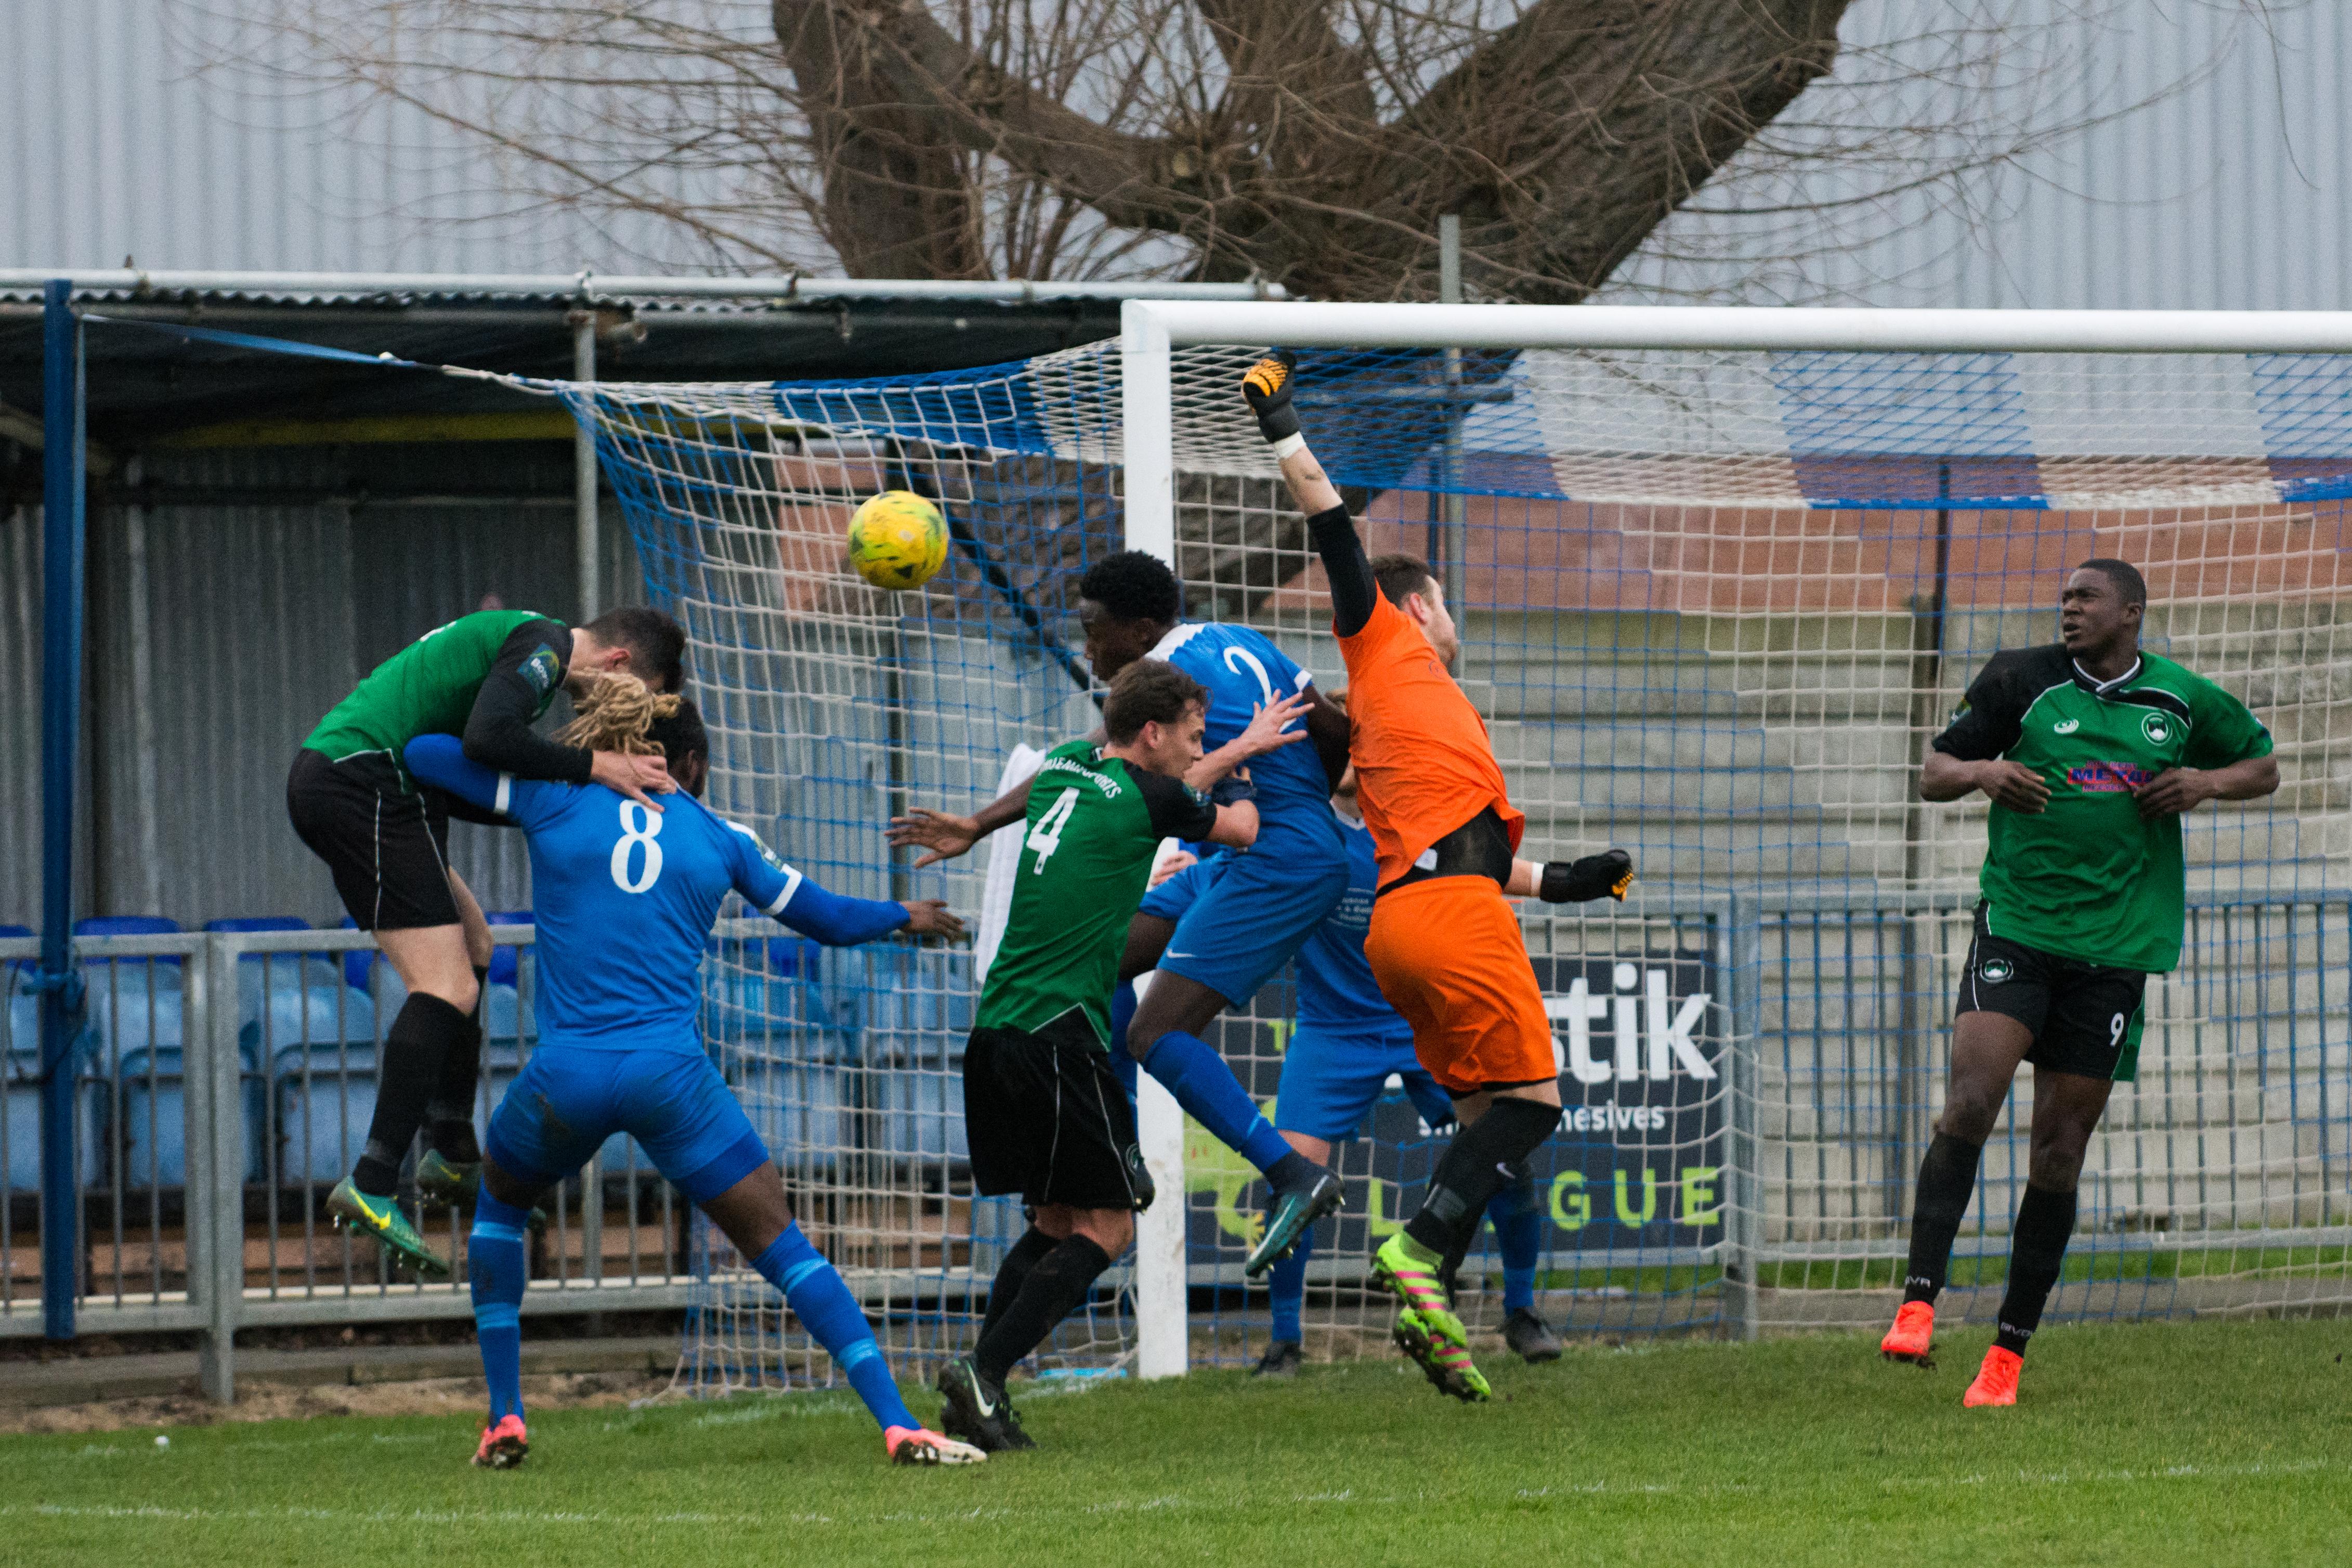 Shoreham FC vs Phoenix Sports 13.01.18 33